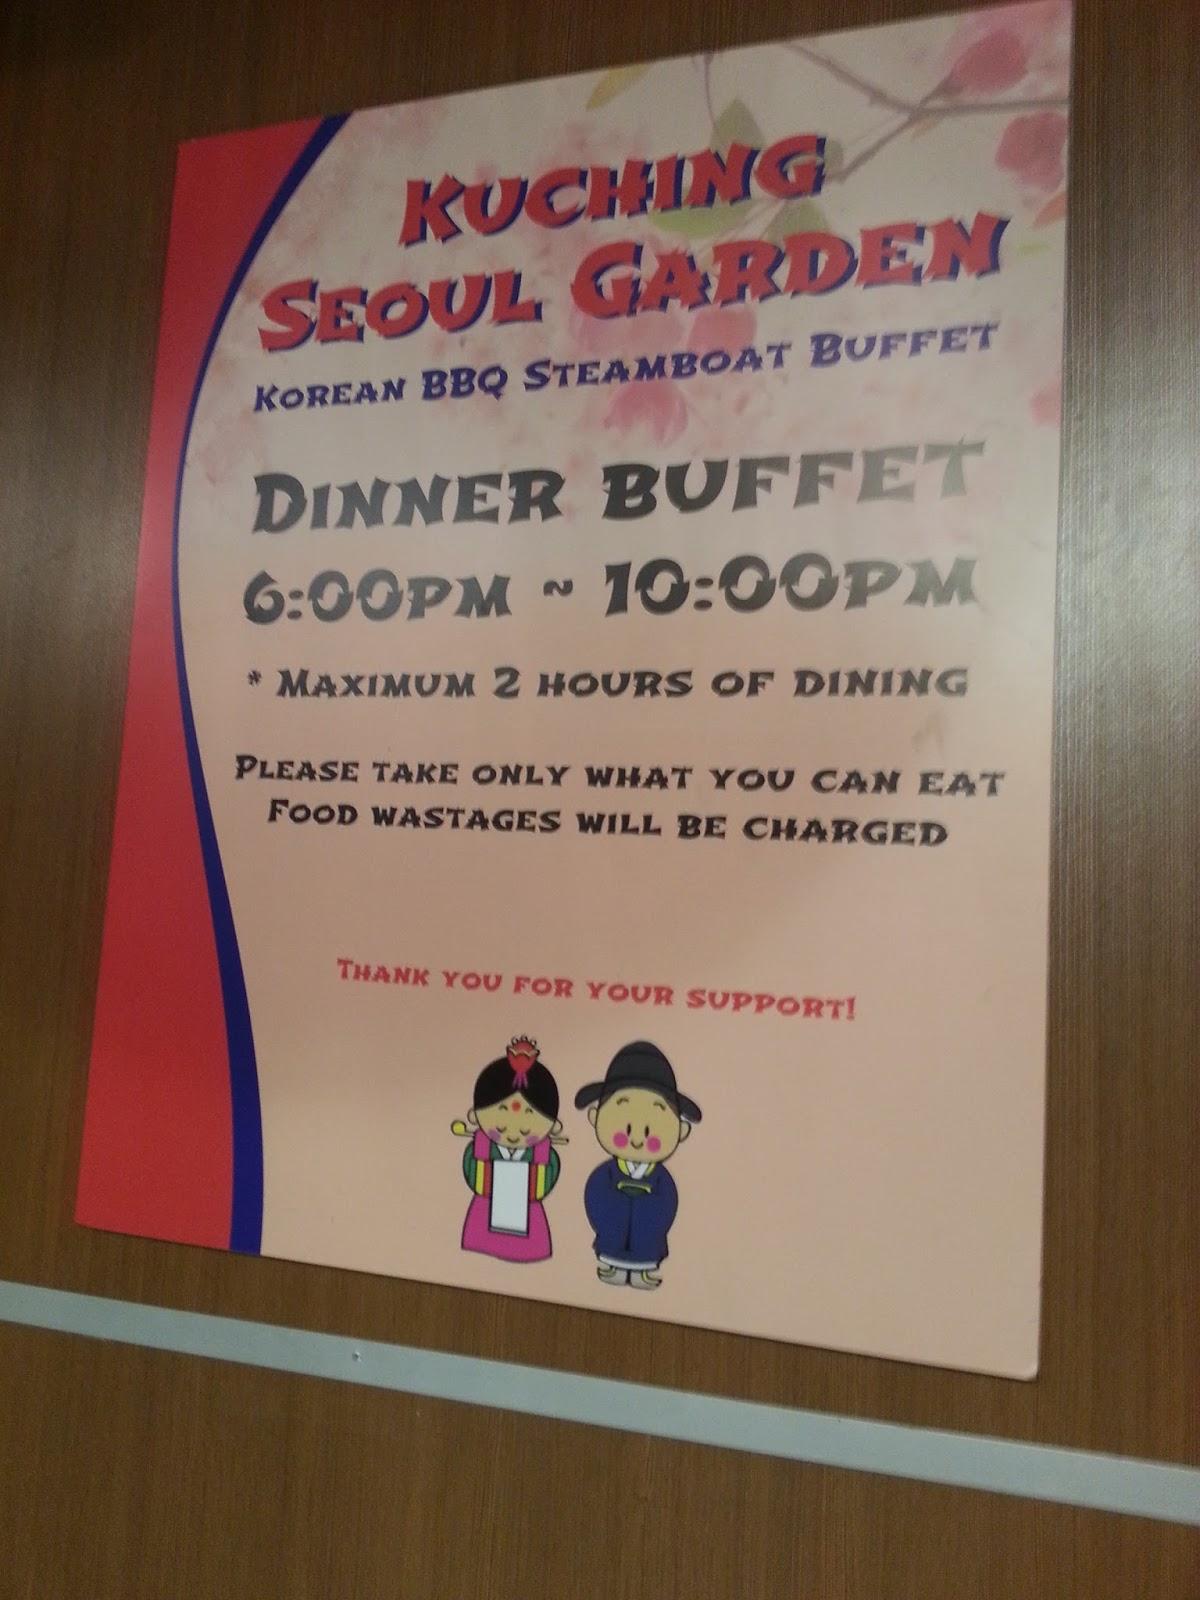 Malaysia Food Blog, Kuching Based: Seoul Garden @ 3rd Mile, Kuching